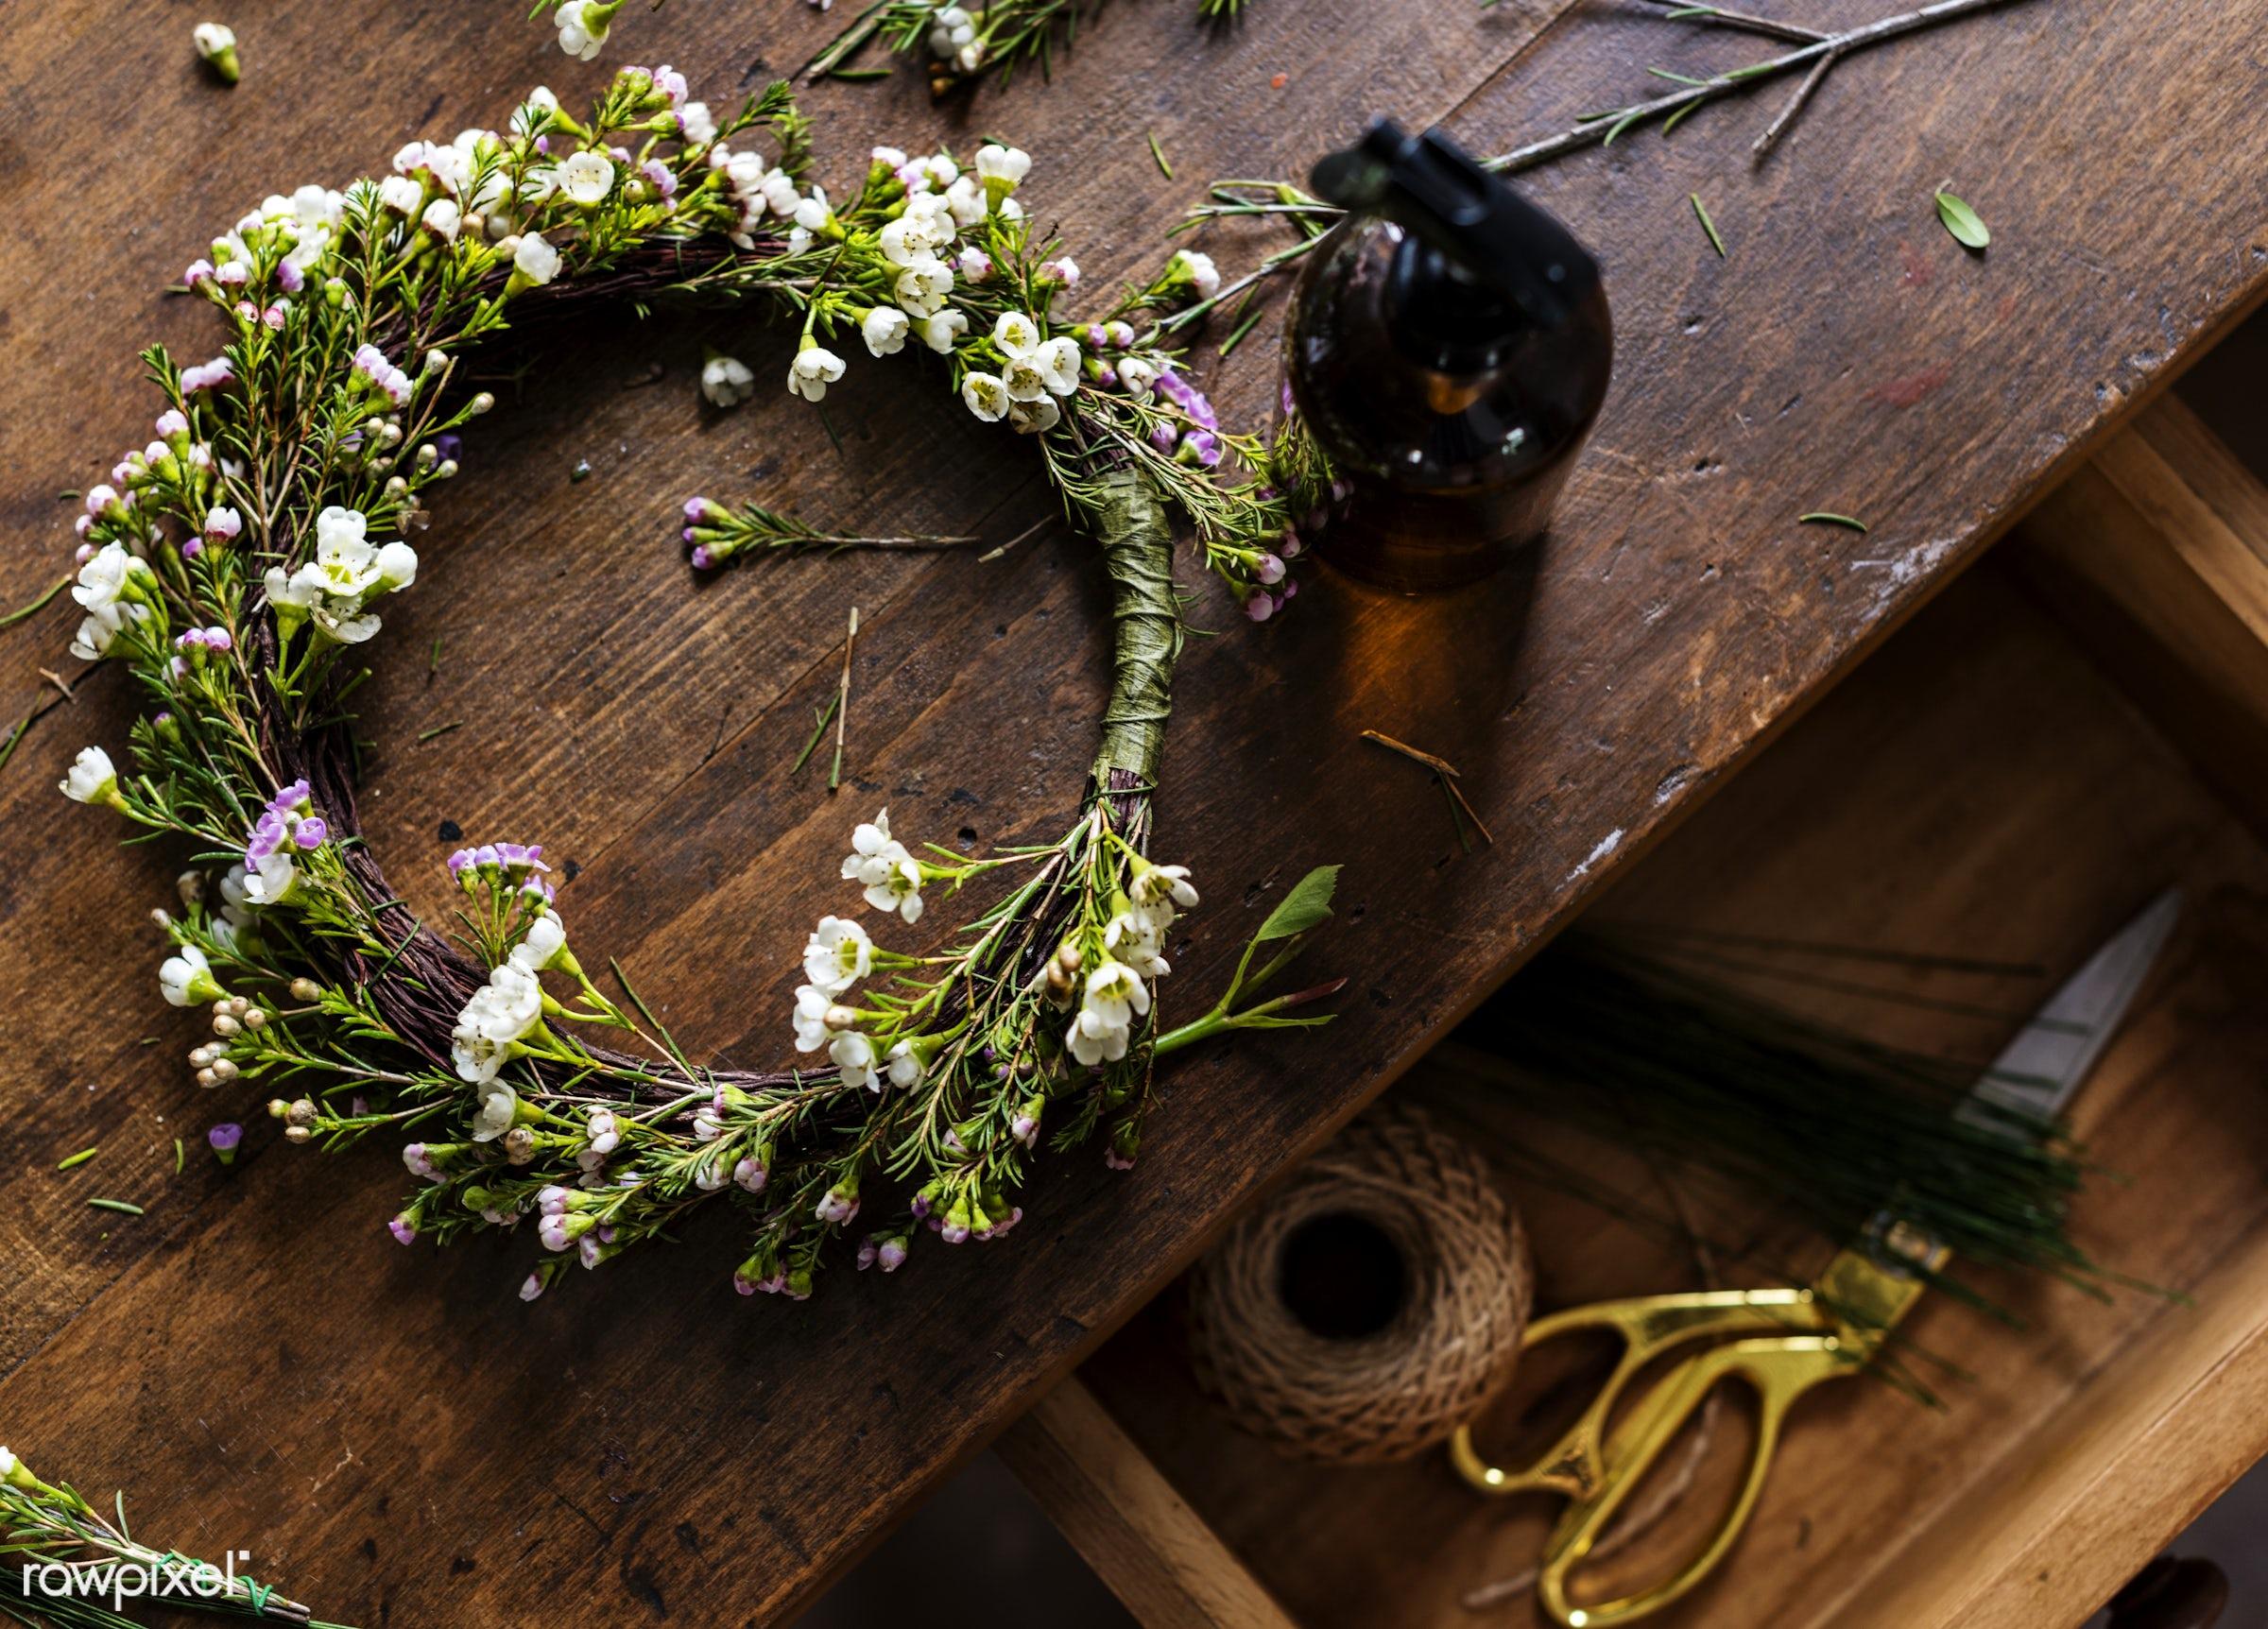 tools, workshop, hobby, skill, wreath, flowers, decoration, art, drawer, wooden, table, desk, arrangement